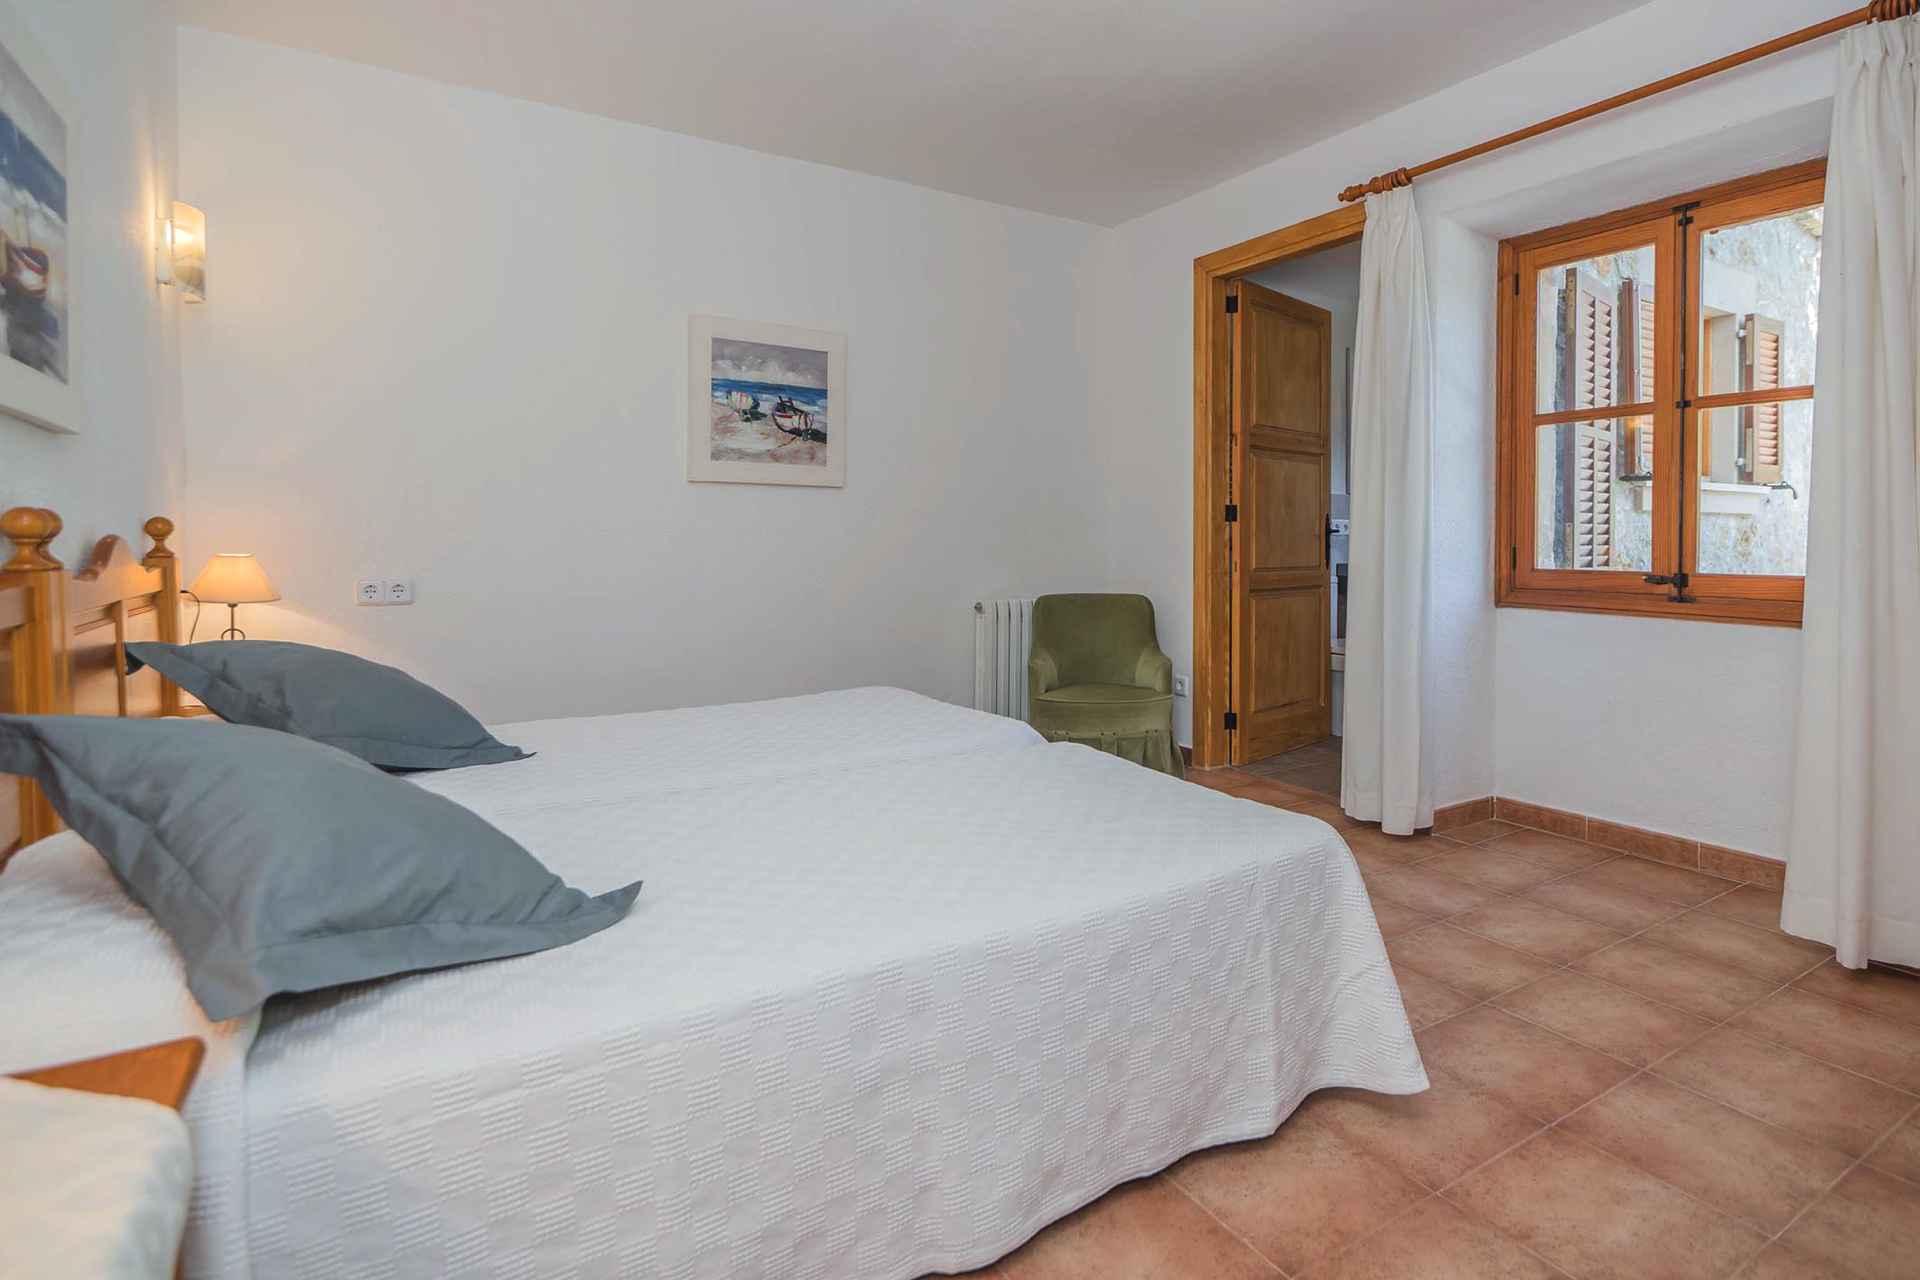 01-296 Weingut Finca Norden Mallorca Bild 33